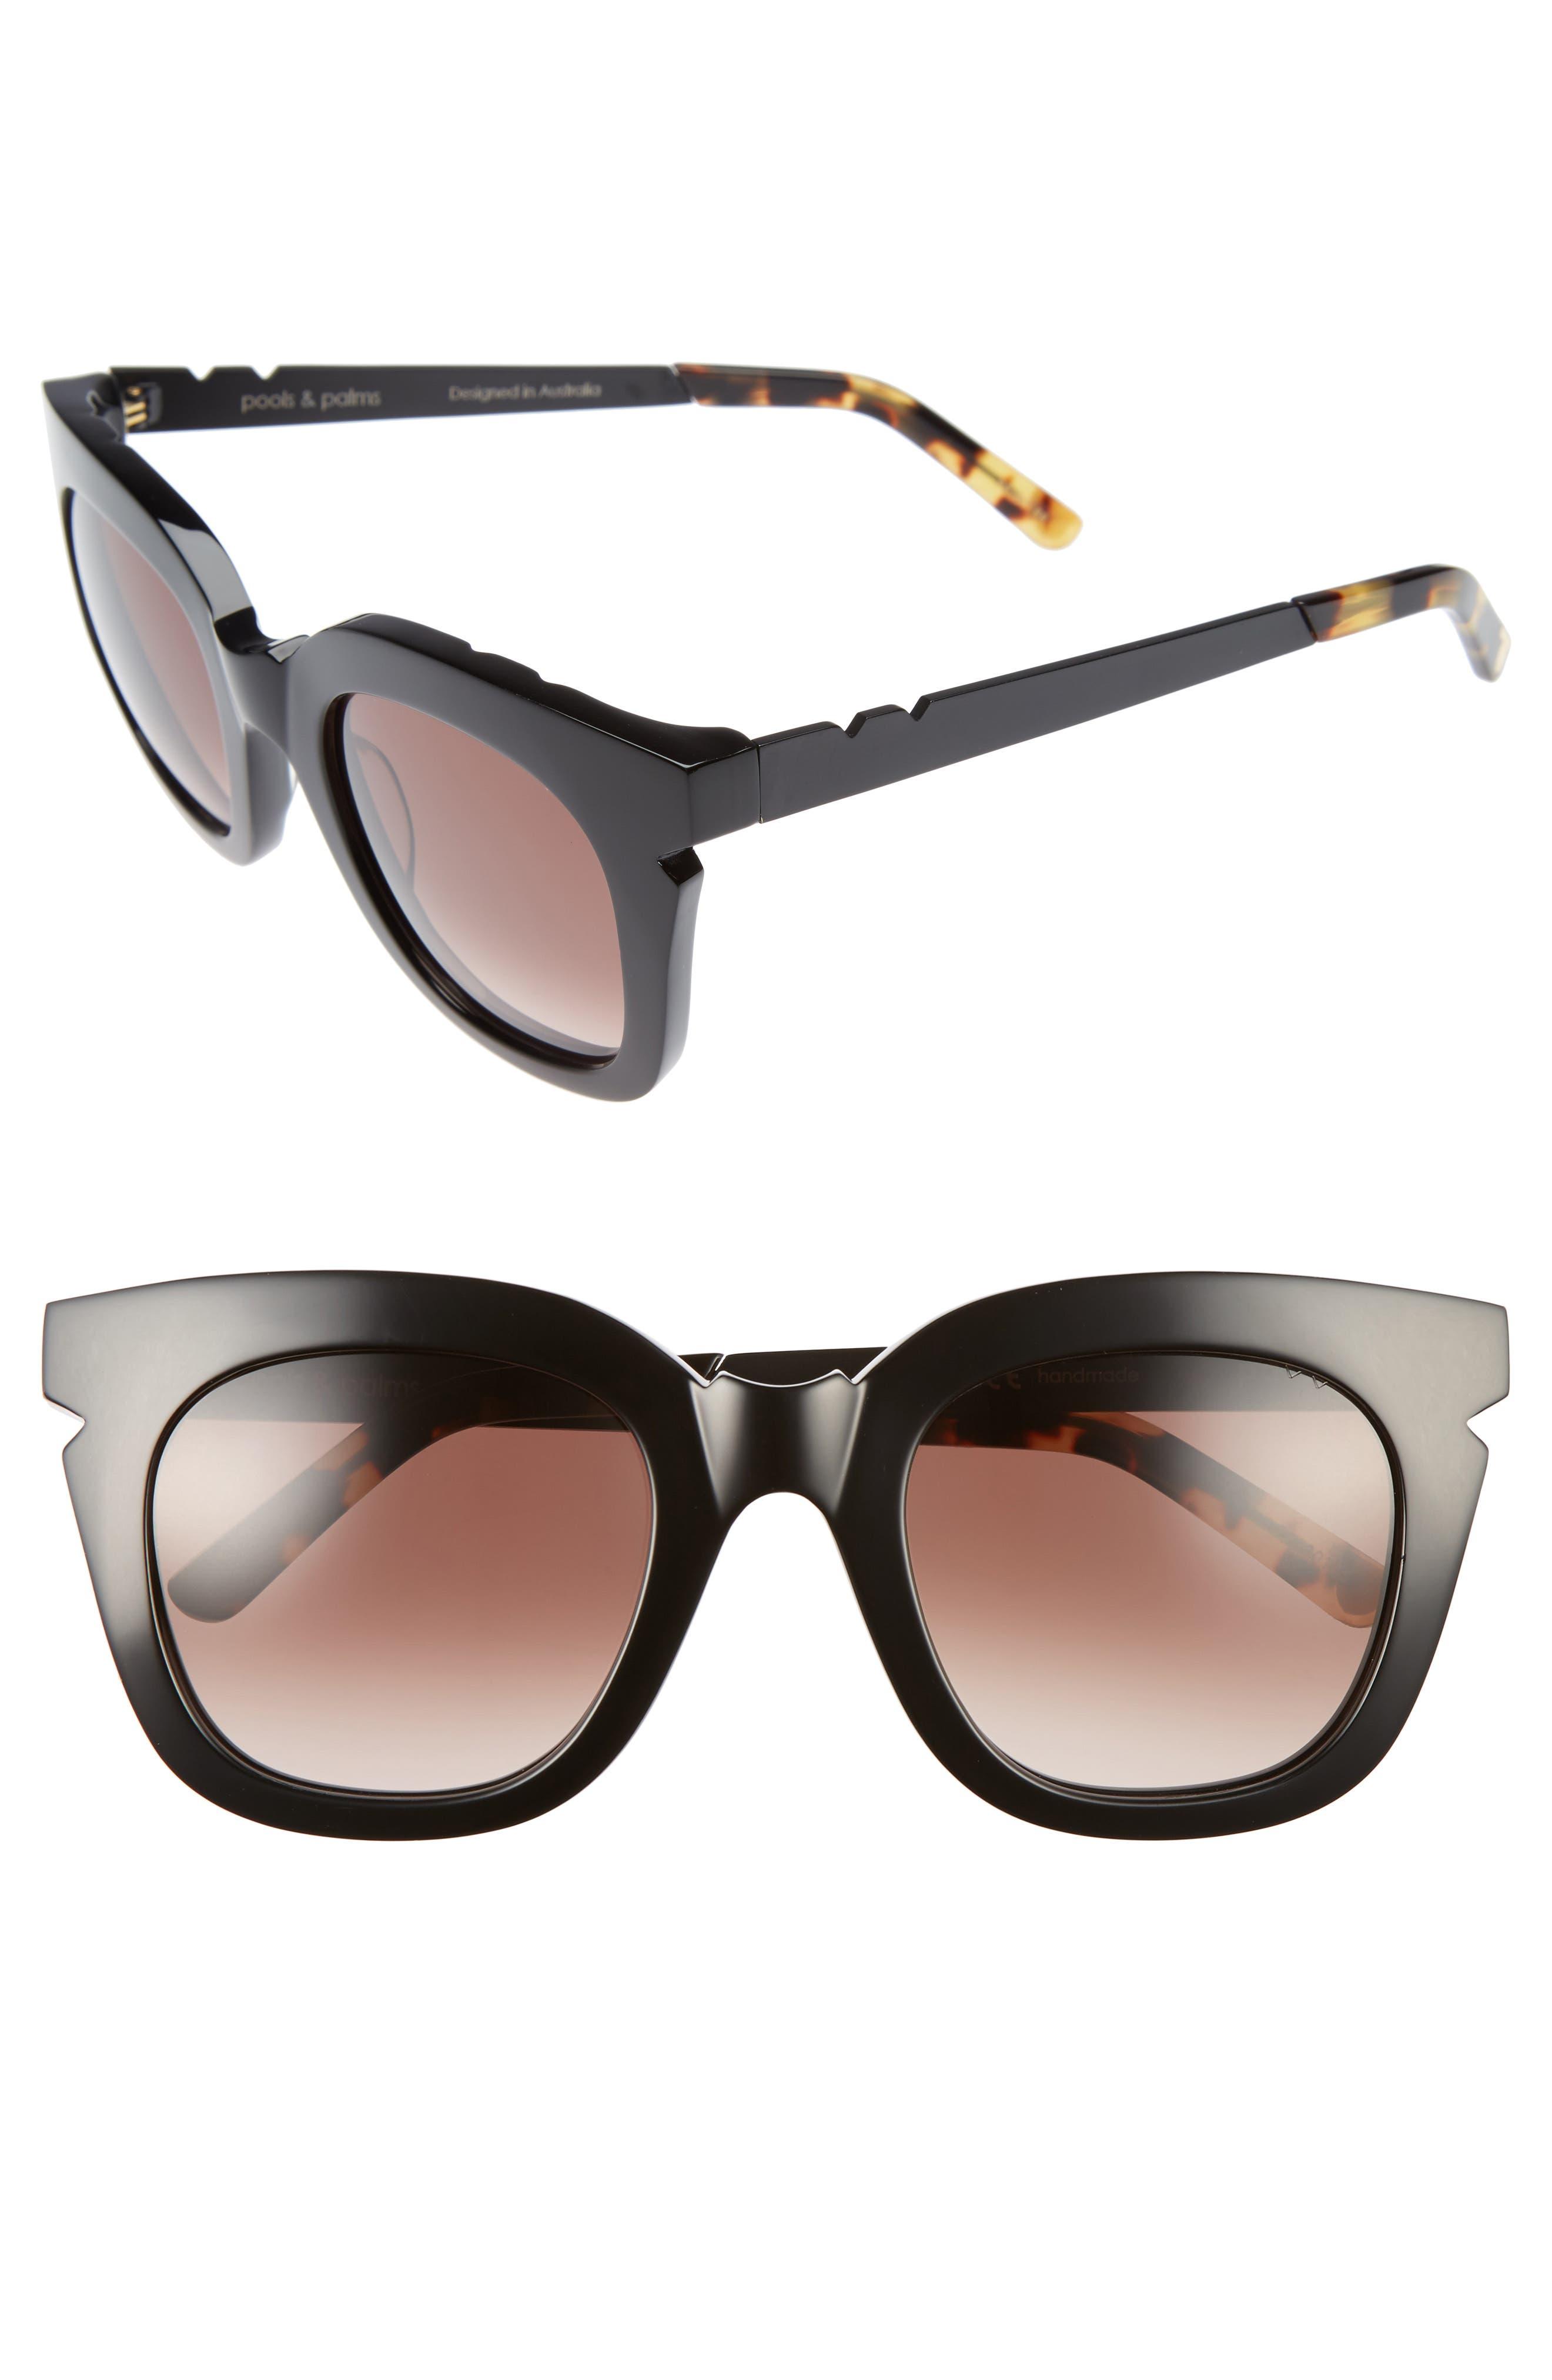 Pools & Palms 50mm Sunglasses,                         Main,                         color, BLACK/ BROWN